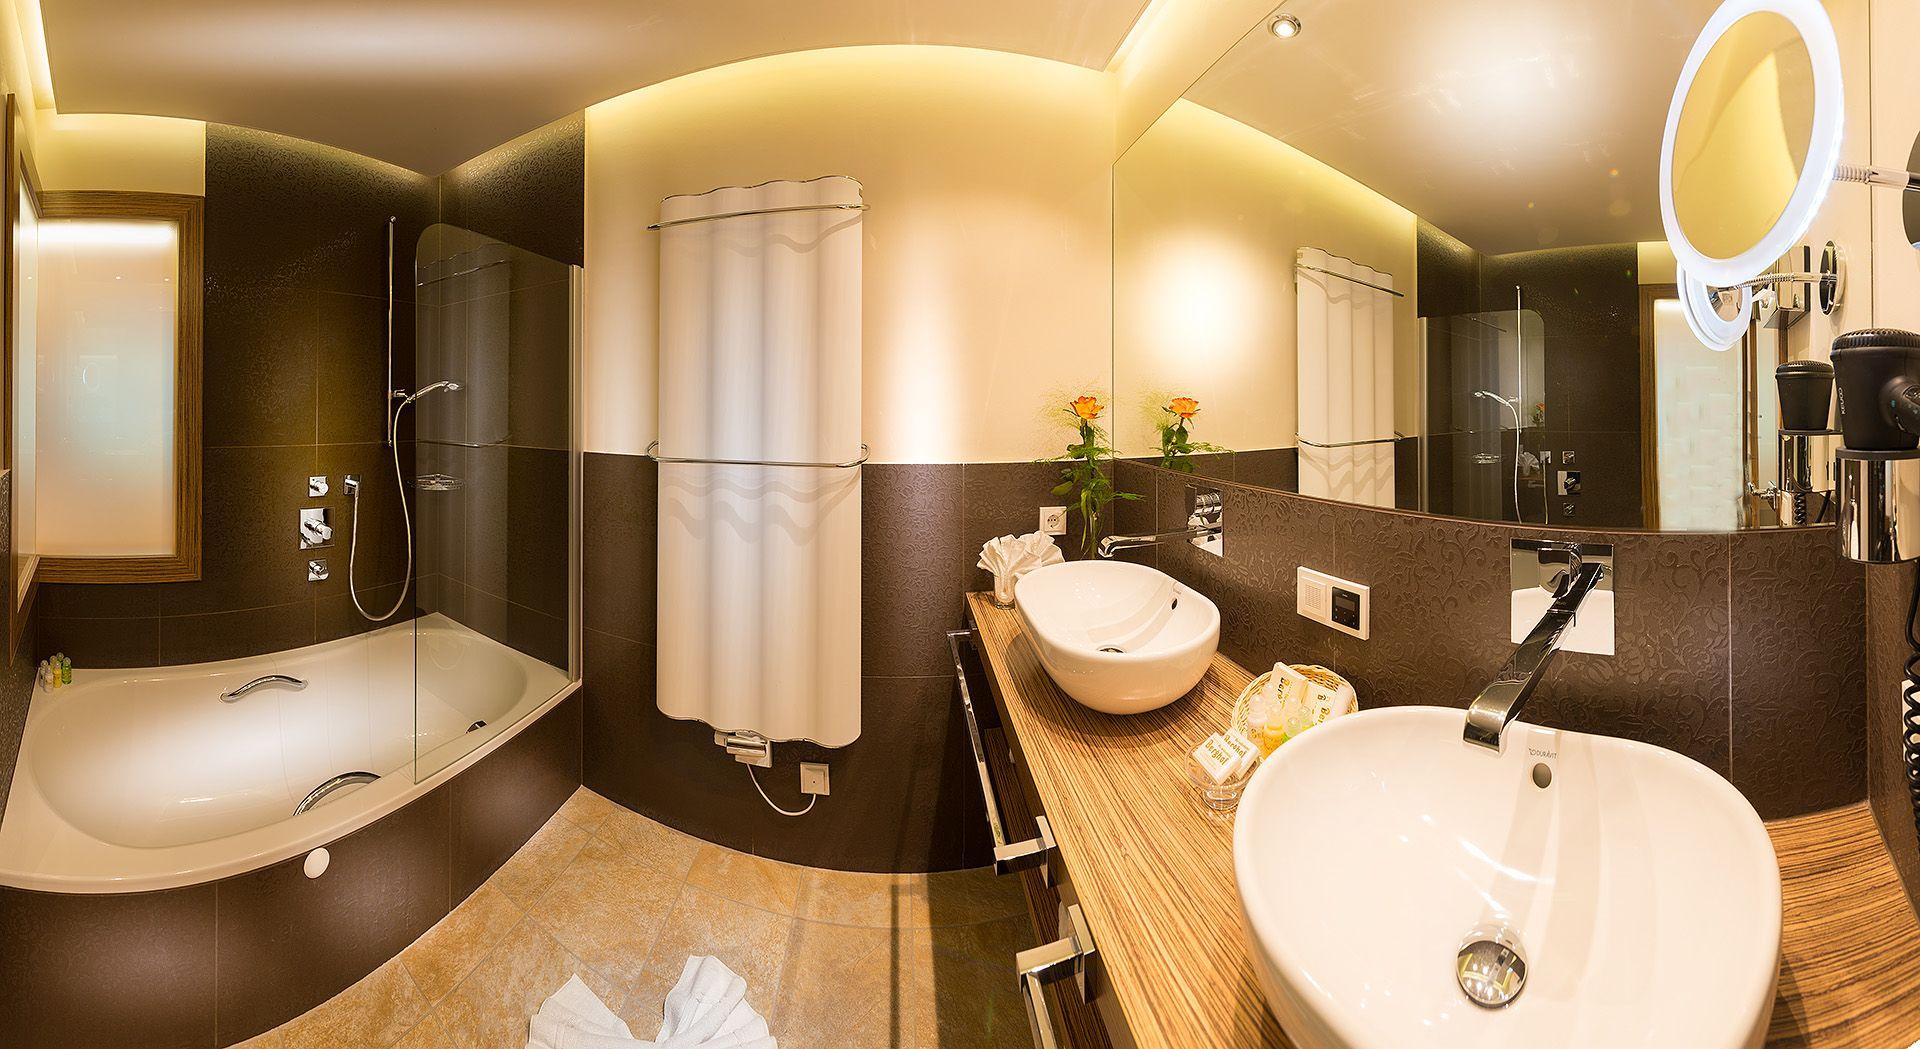 Badezimmer Hotel ~ Neue panorama familiensuiten badezimmer verwöhnhotel berghof 4